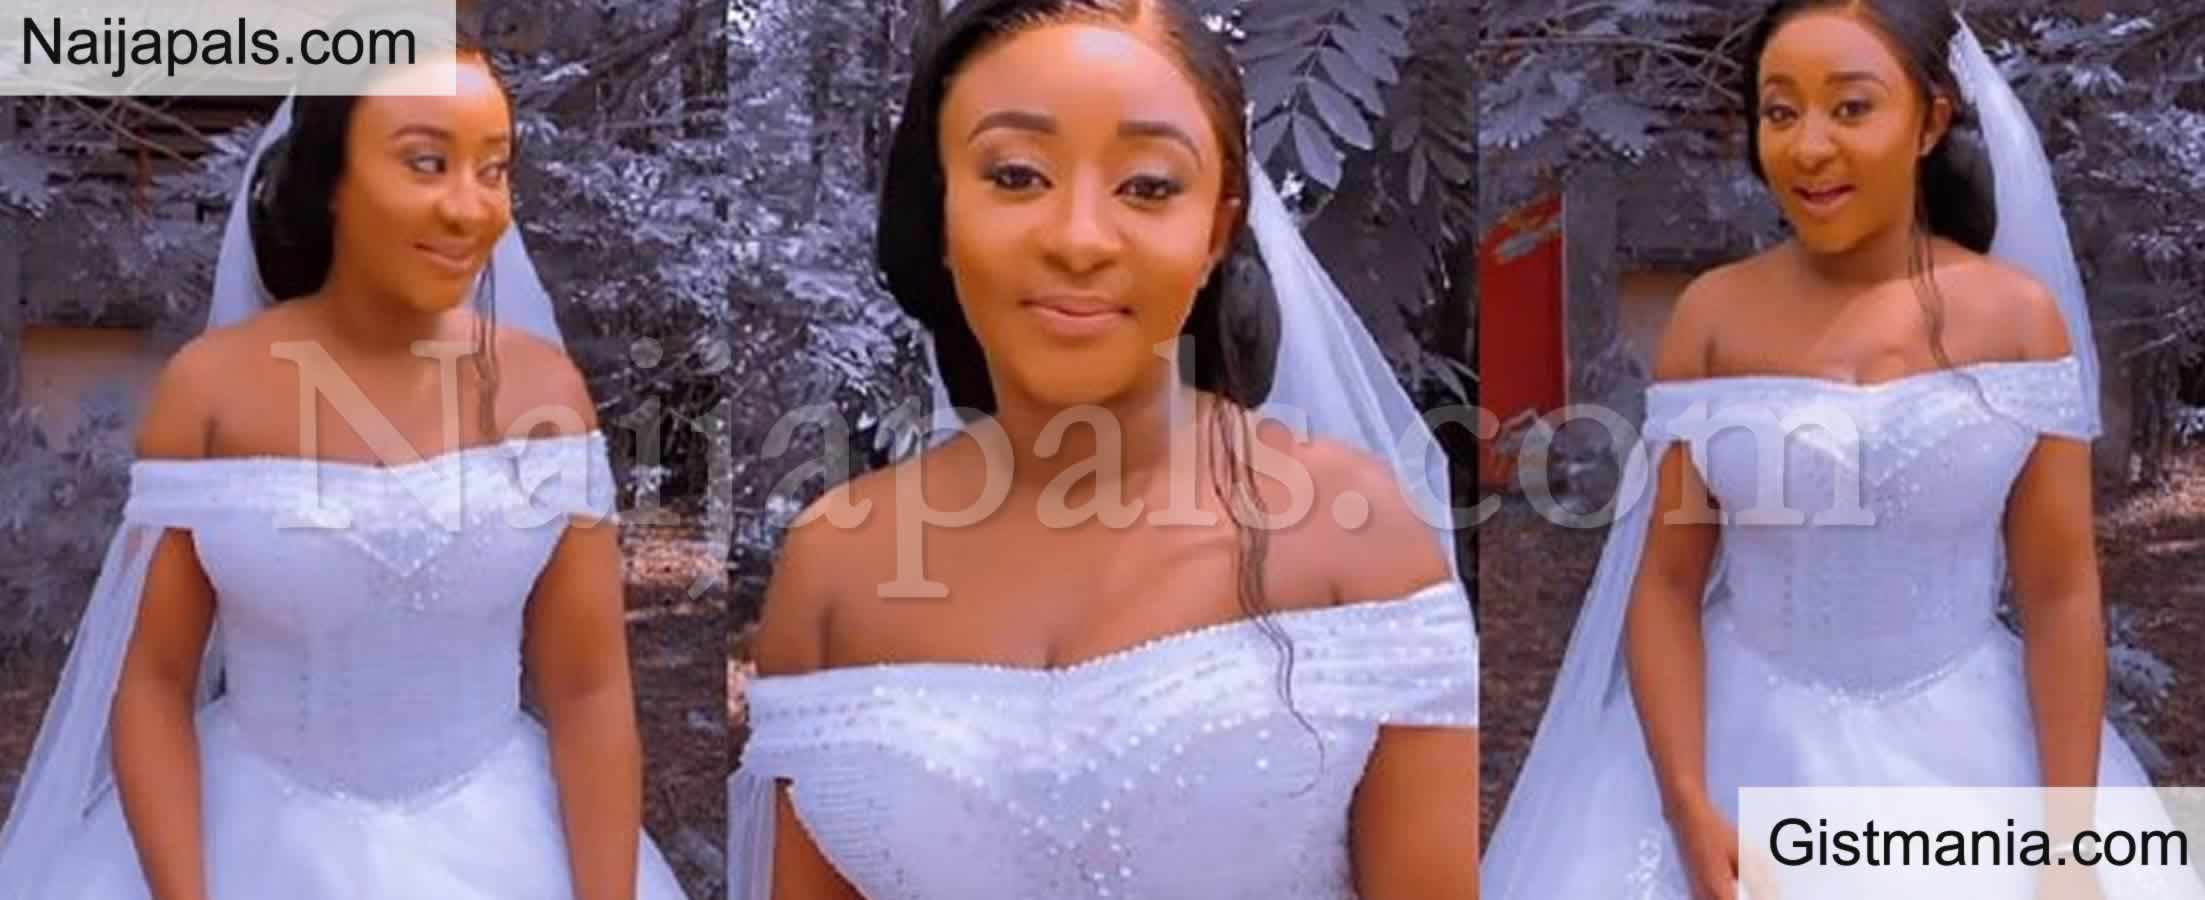 <img alt='.' class='lazyload' data-src='https://img.gistmania.com/emot/video.gif' /><img alt='.' class='lazyload' data-src='https://img.gistmania.com/emot/comment.gif' /> Rumour Has It That Nollywood Actress, <b>Ini Edo Just Had A Secret Wedding</b> (Photo Speaks)